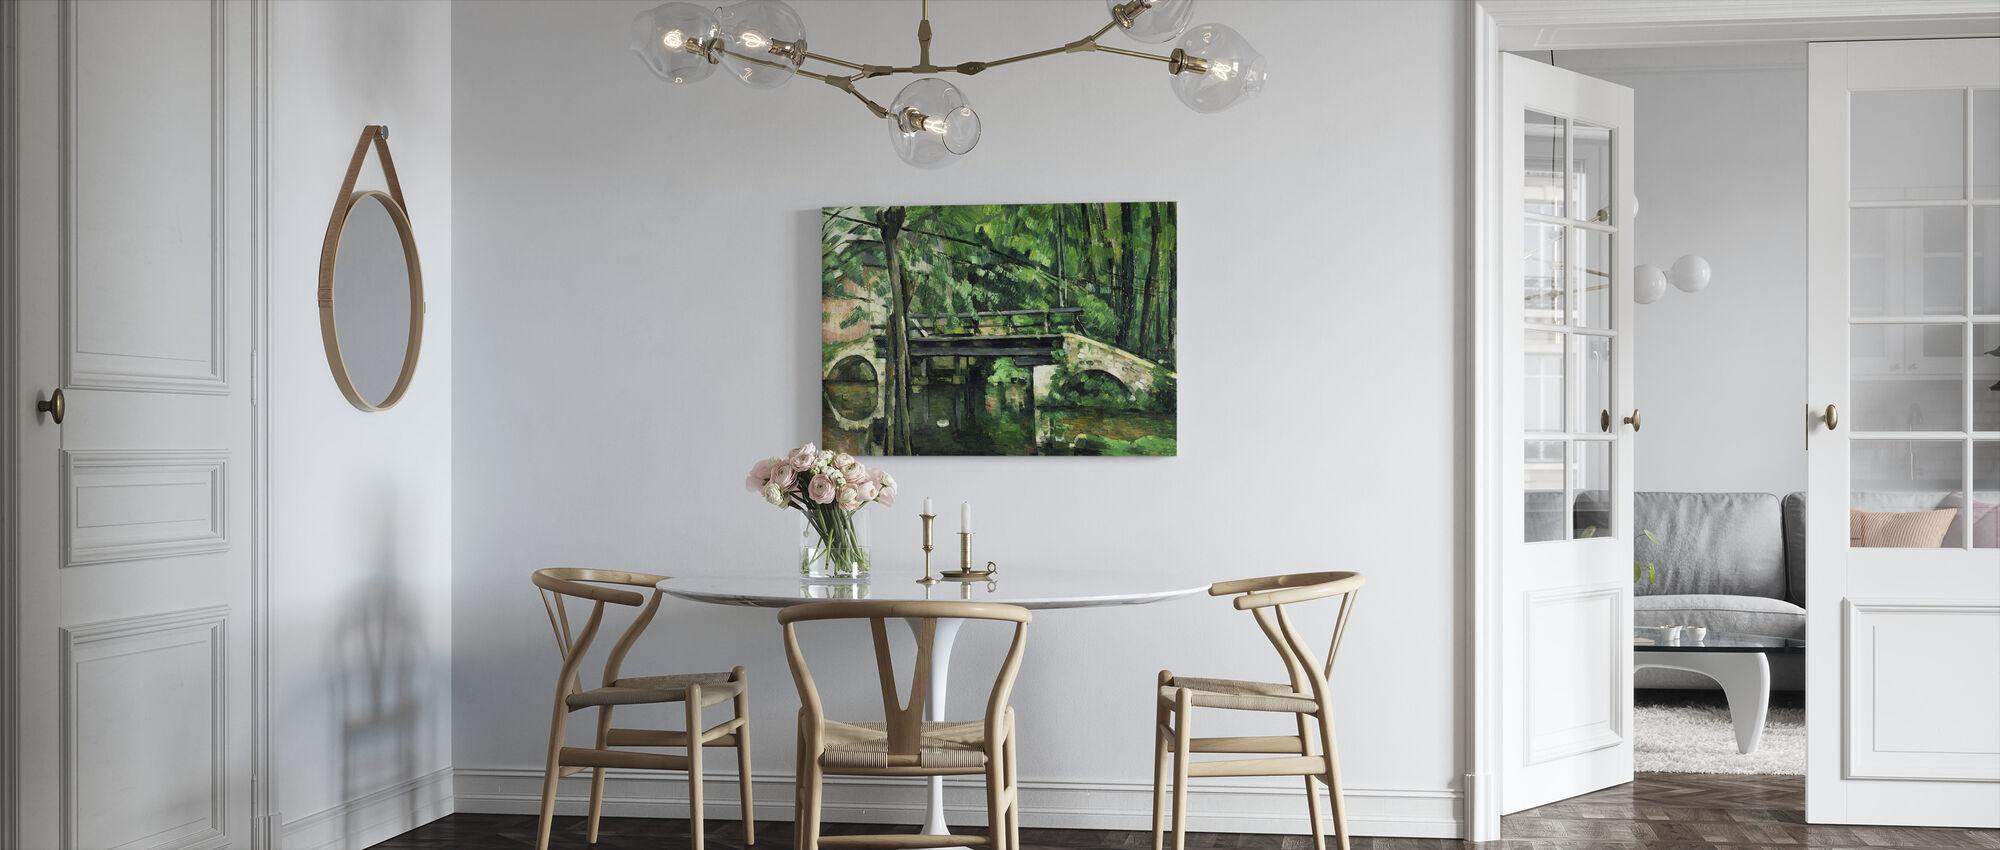 Paulus Cezanne - Canvastavla - Kök